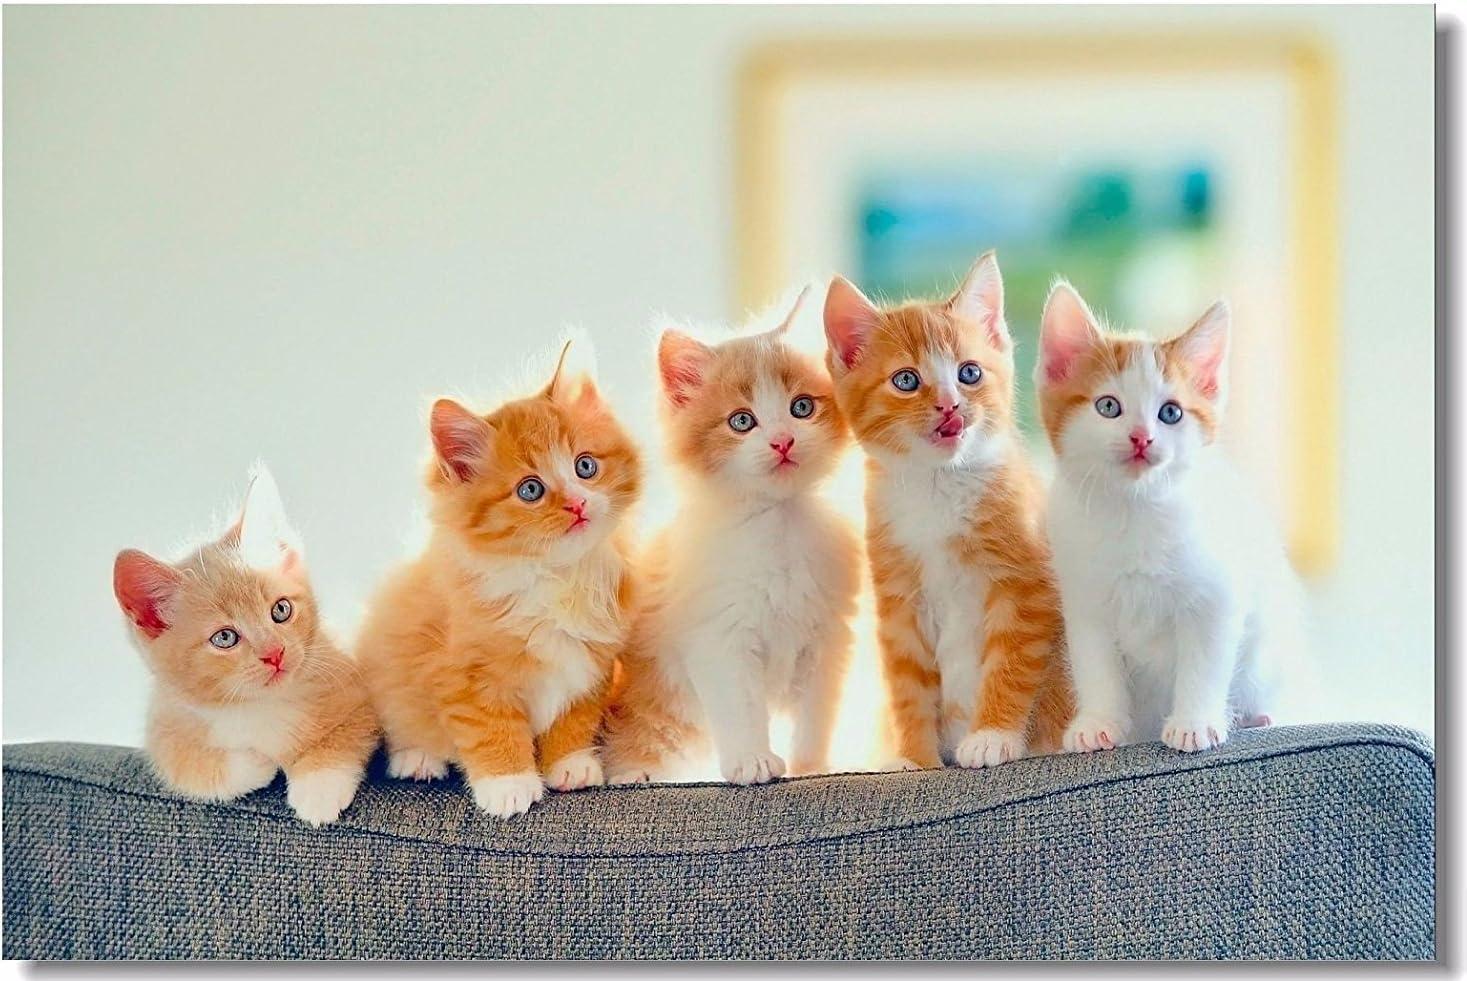 Heartland Plush Throw Blanket Kittens 50x60 Soft /& Warm